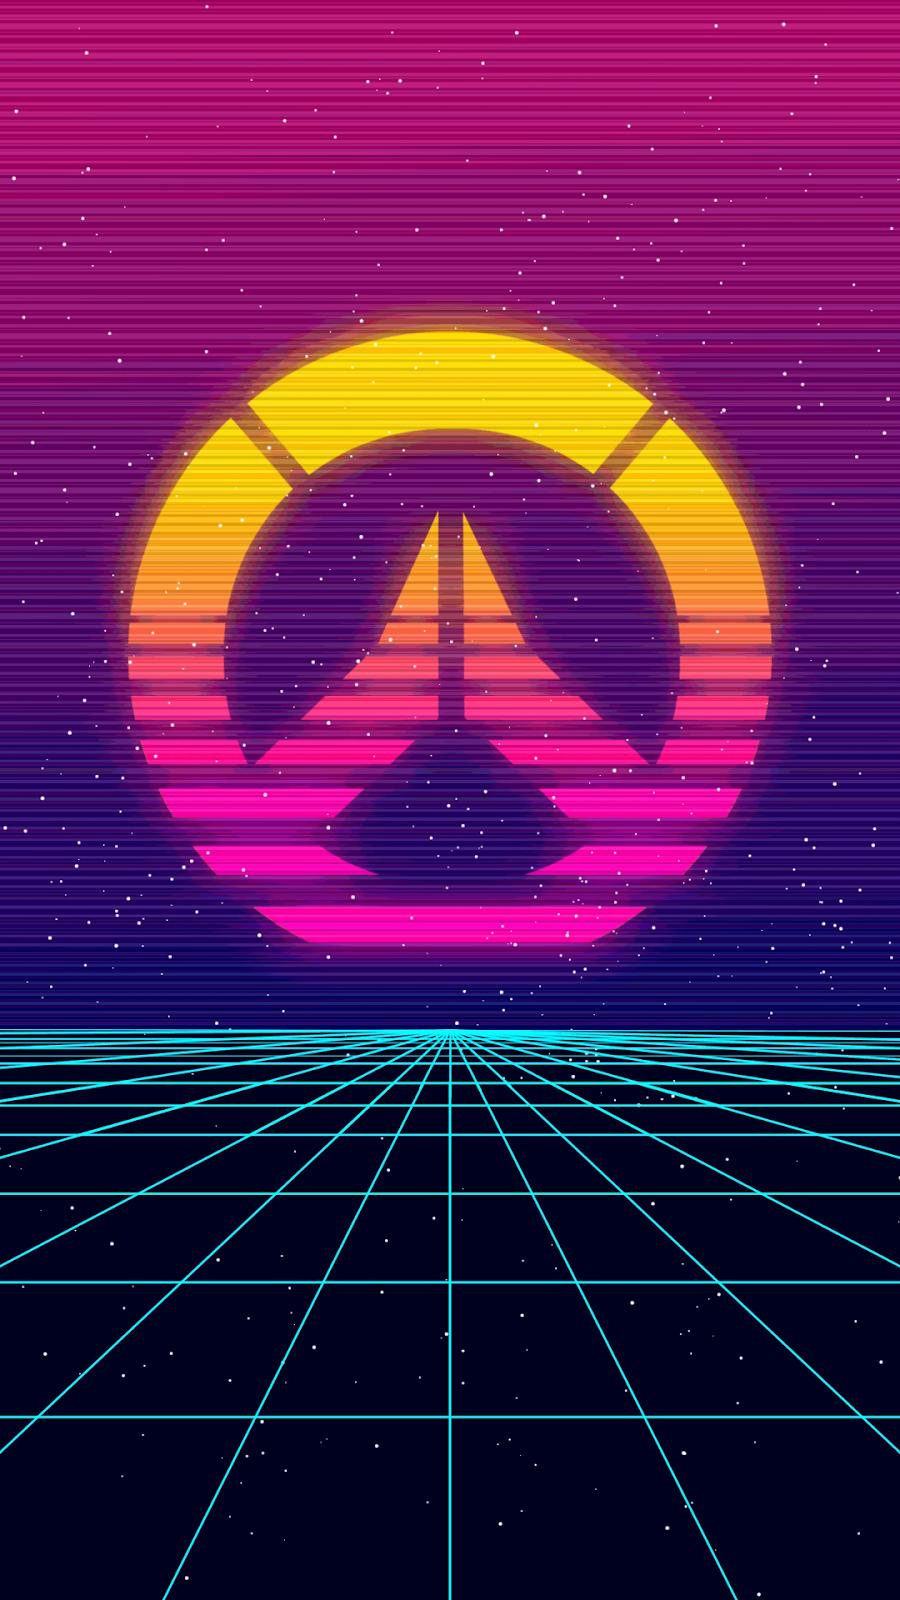 overwatch vaporwave